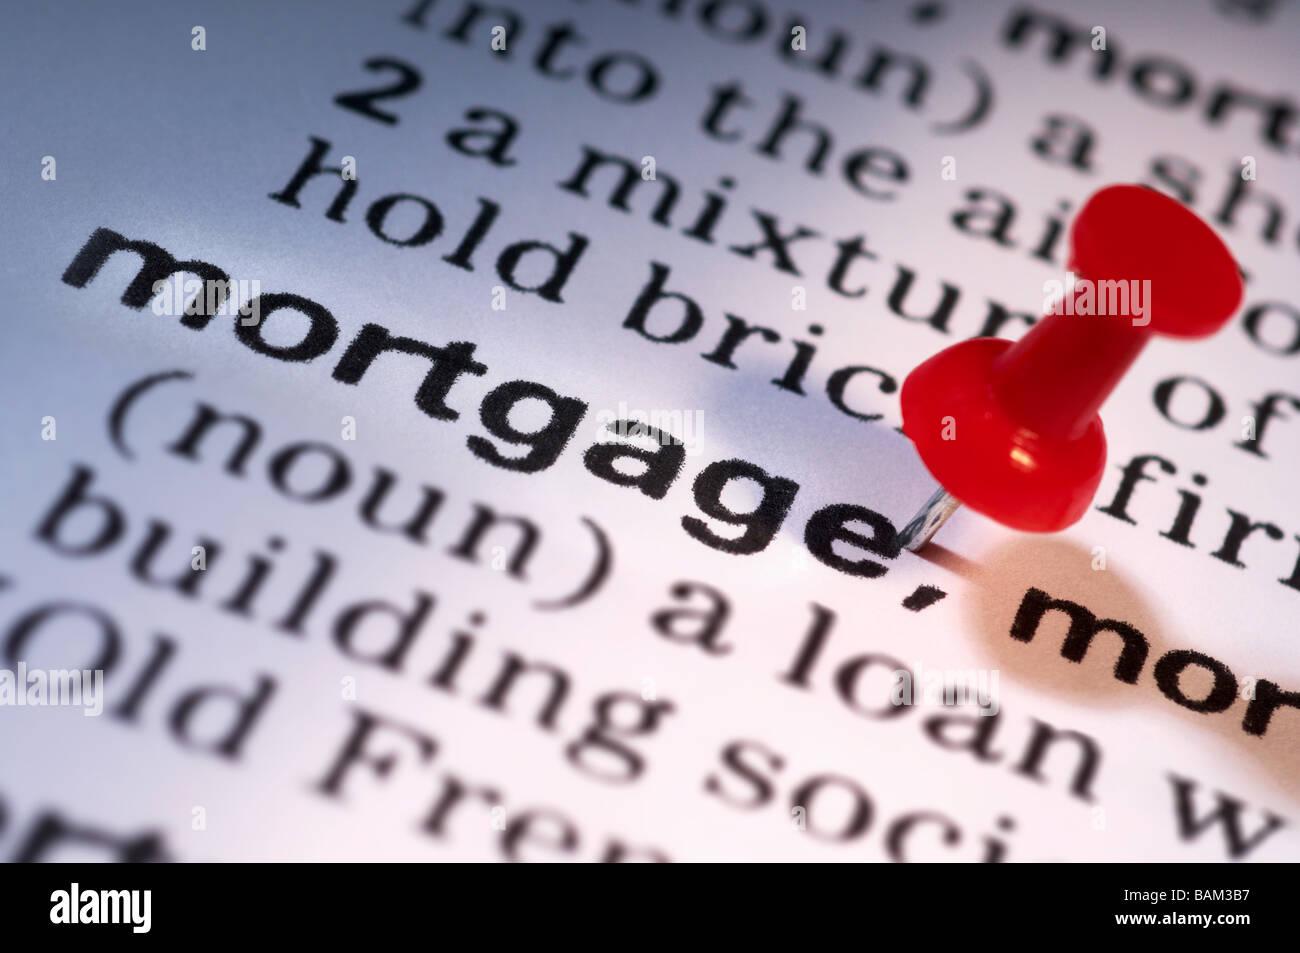 Thumb tack on word mortgage - Stock Image